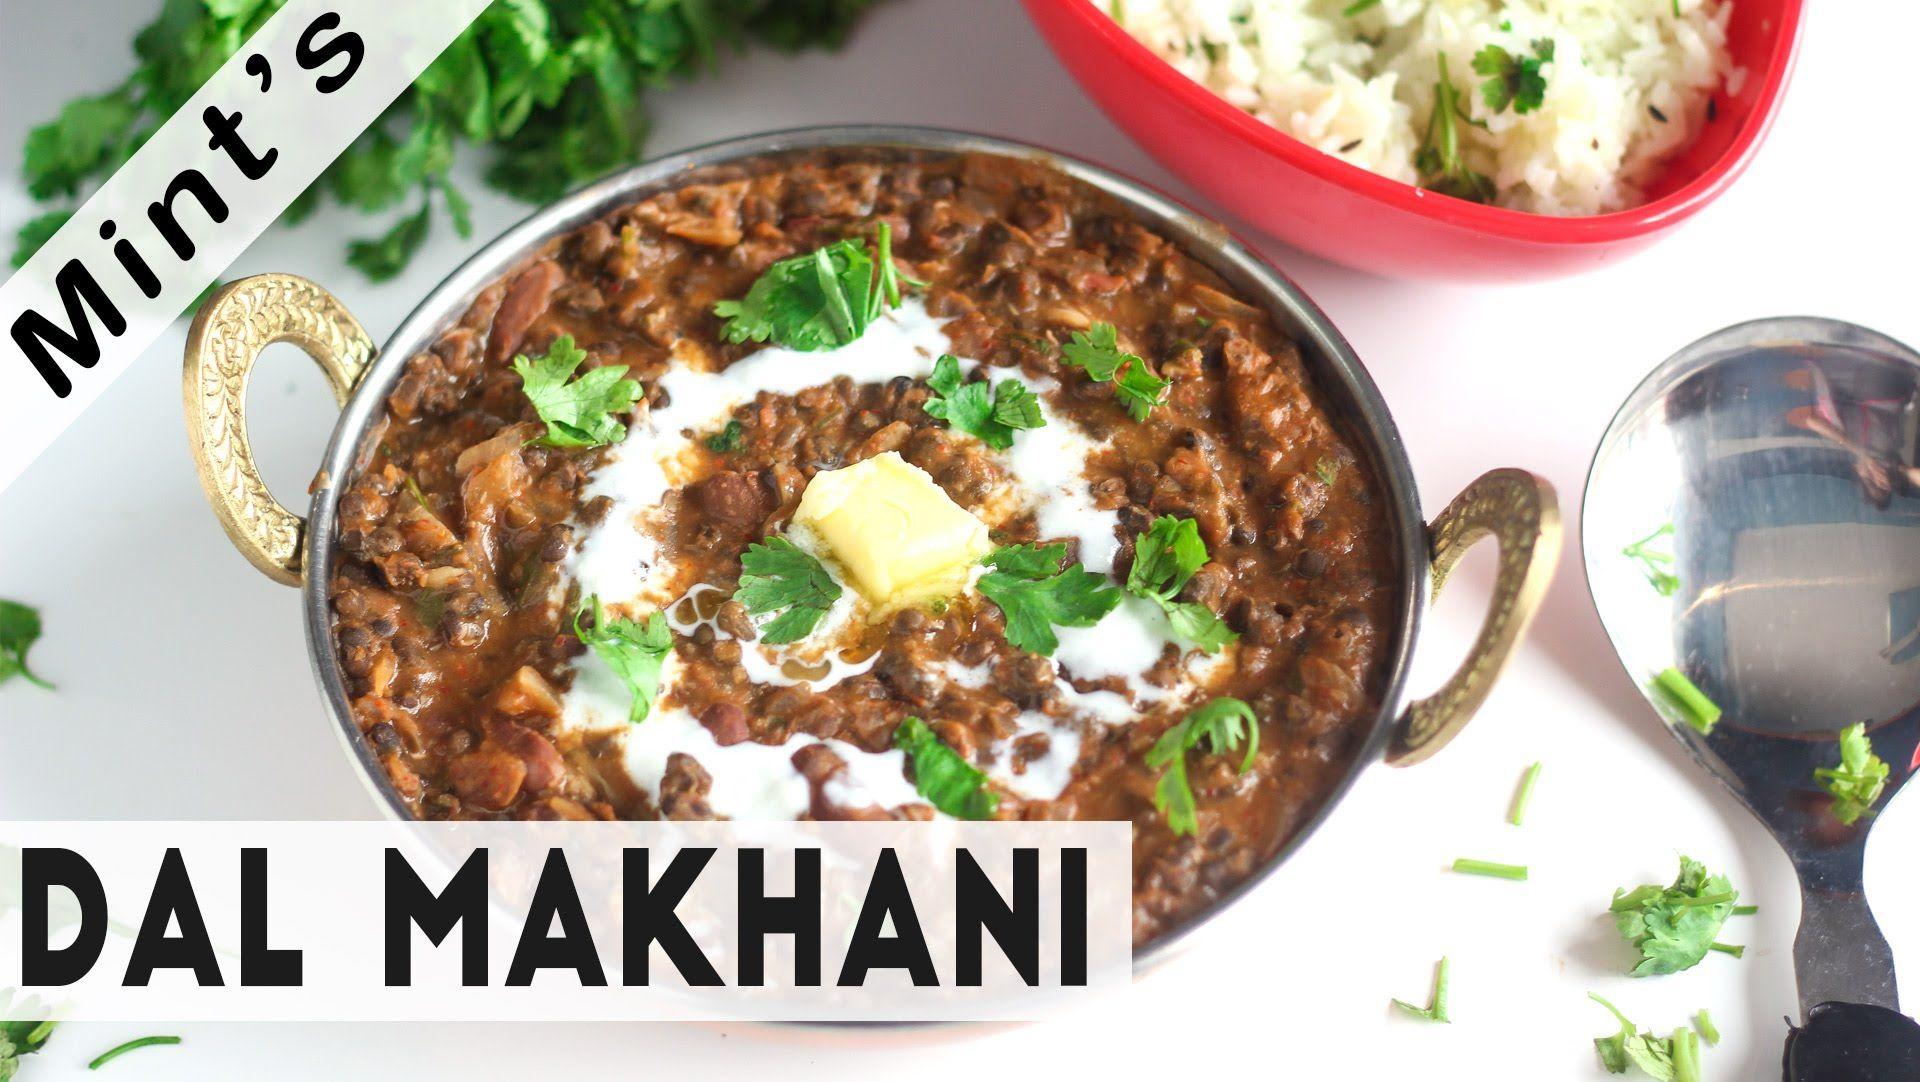 Httpcooking recipes easyvegvegetariandal makhani recipe httpcooking recipes easyvegvegetarian forumfinder Images